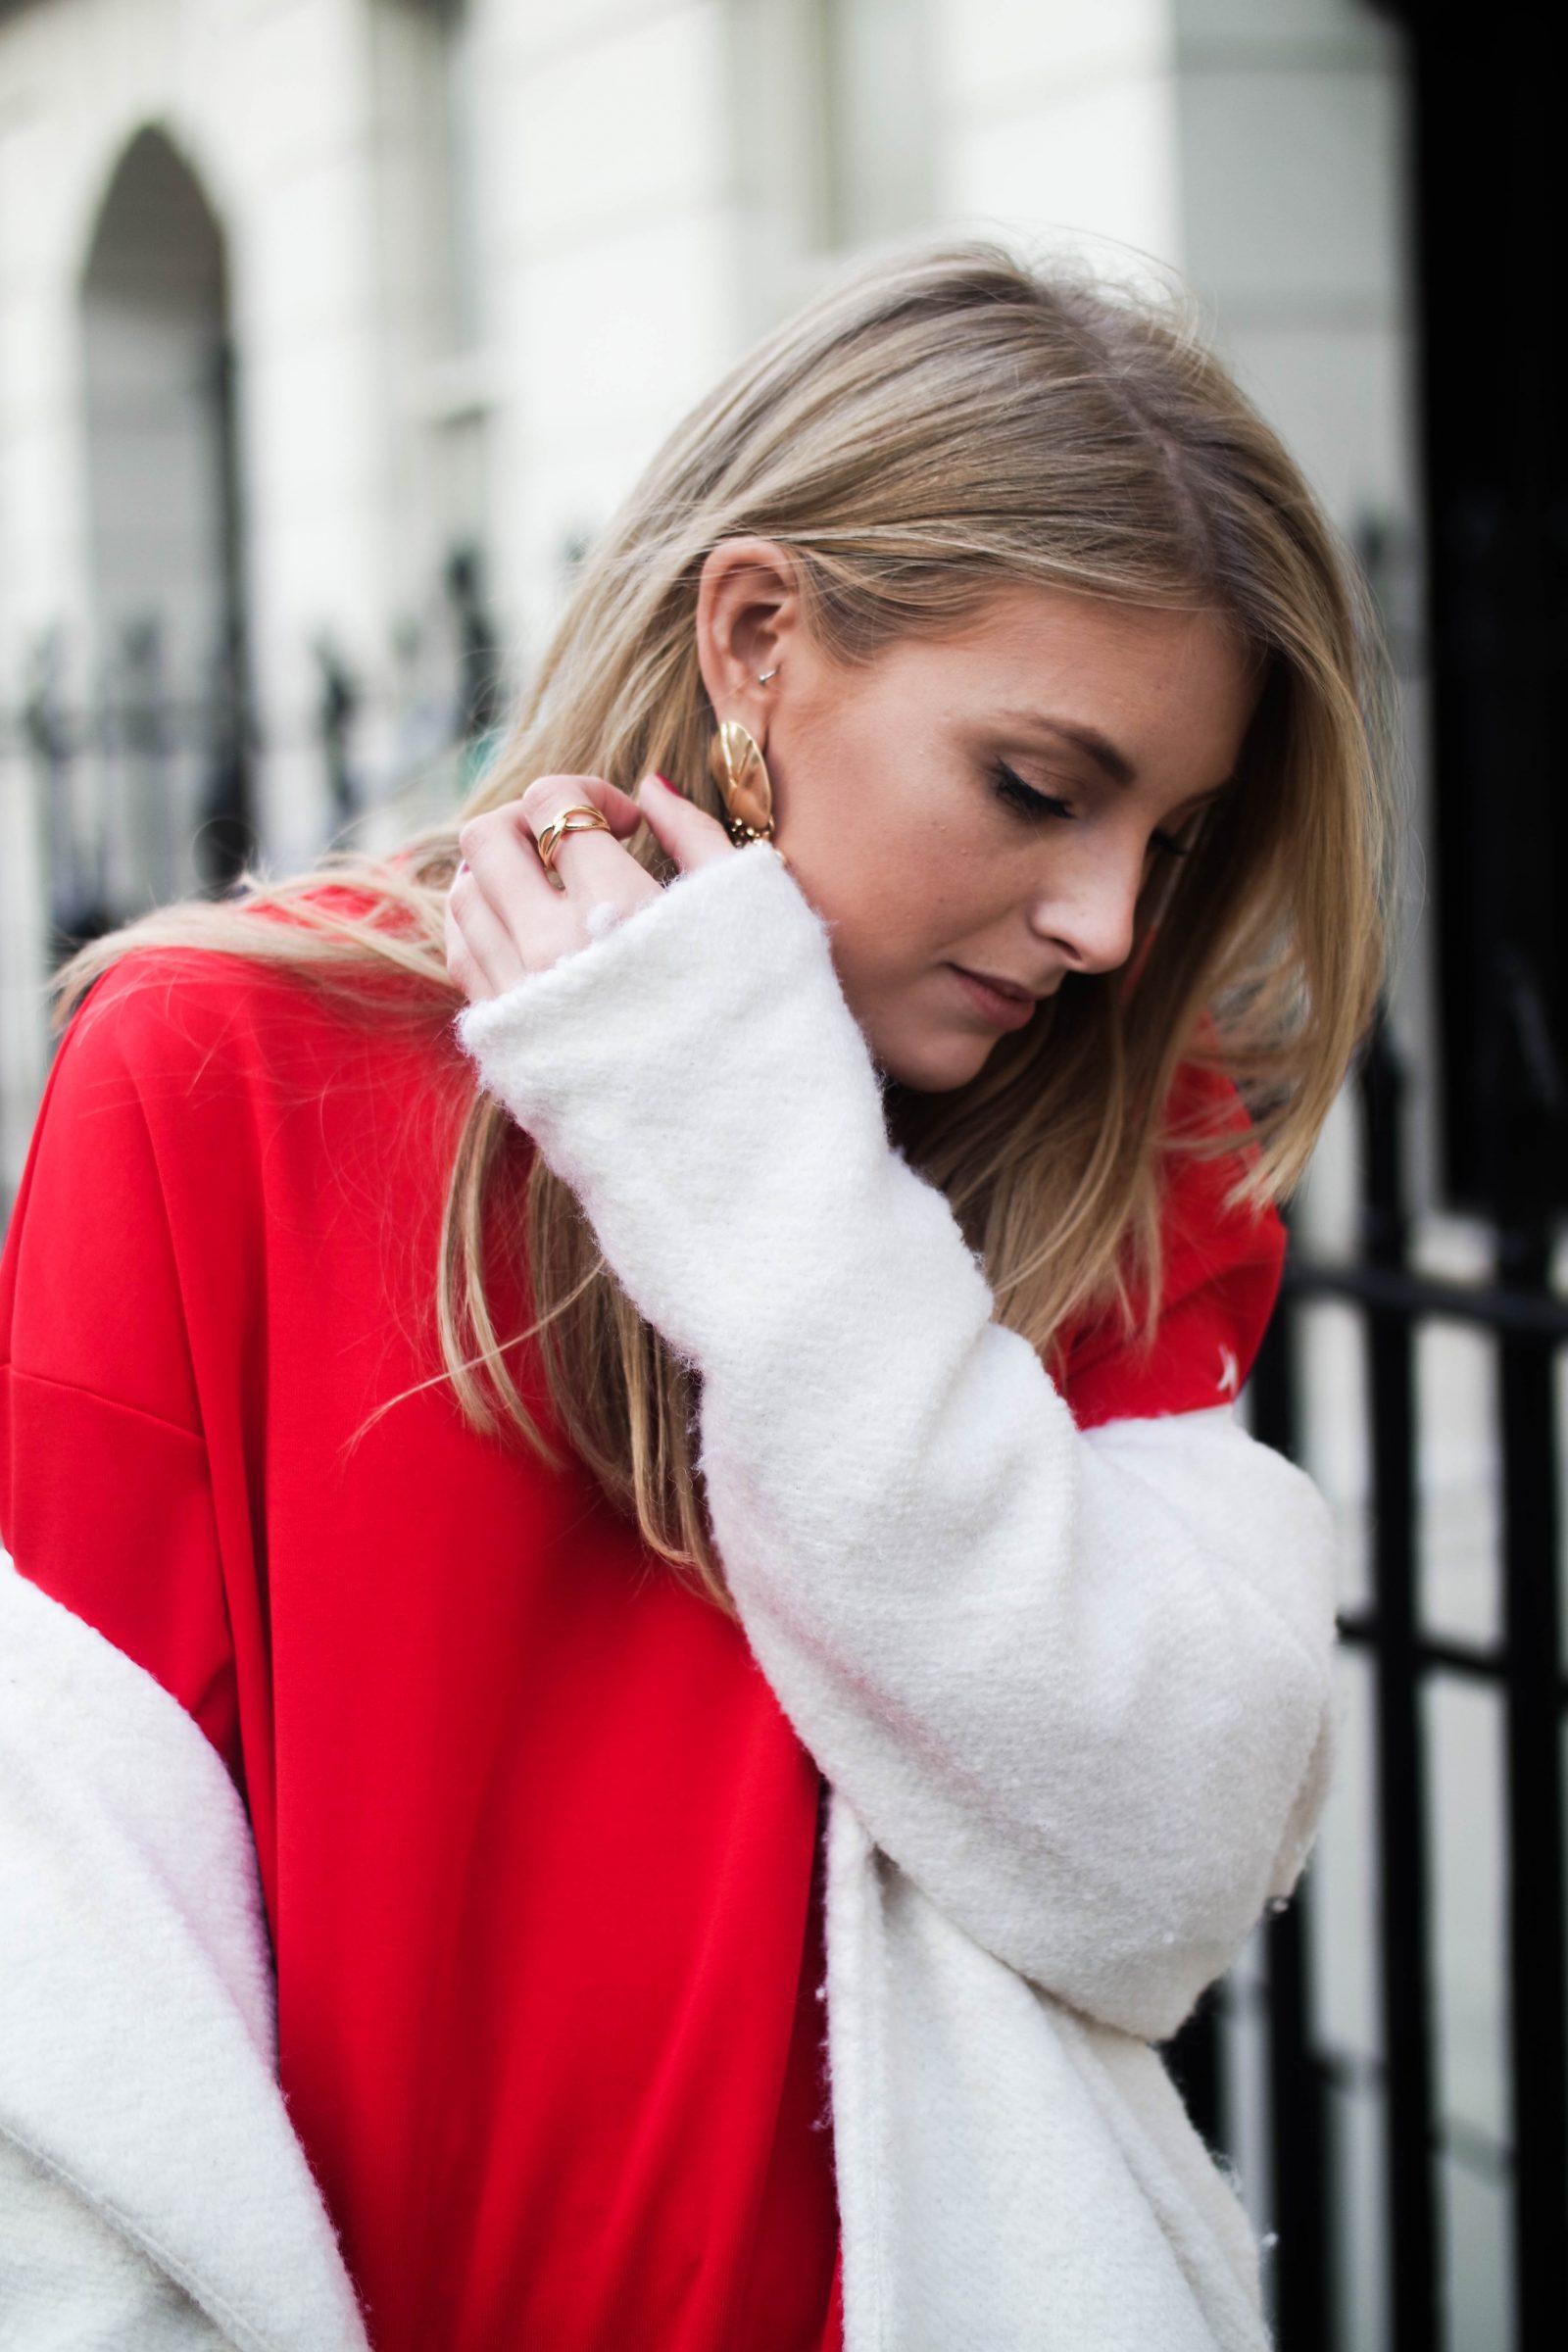 LFW DAY 2 - Red Alert - Fashion Blogger